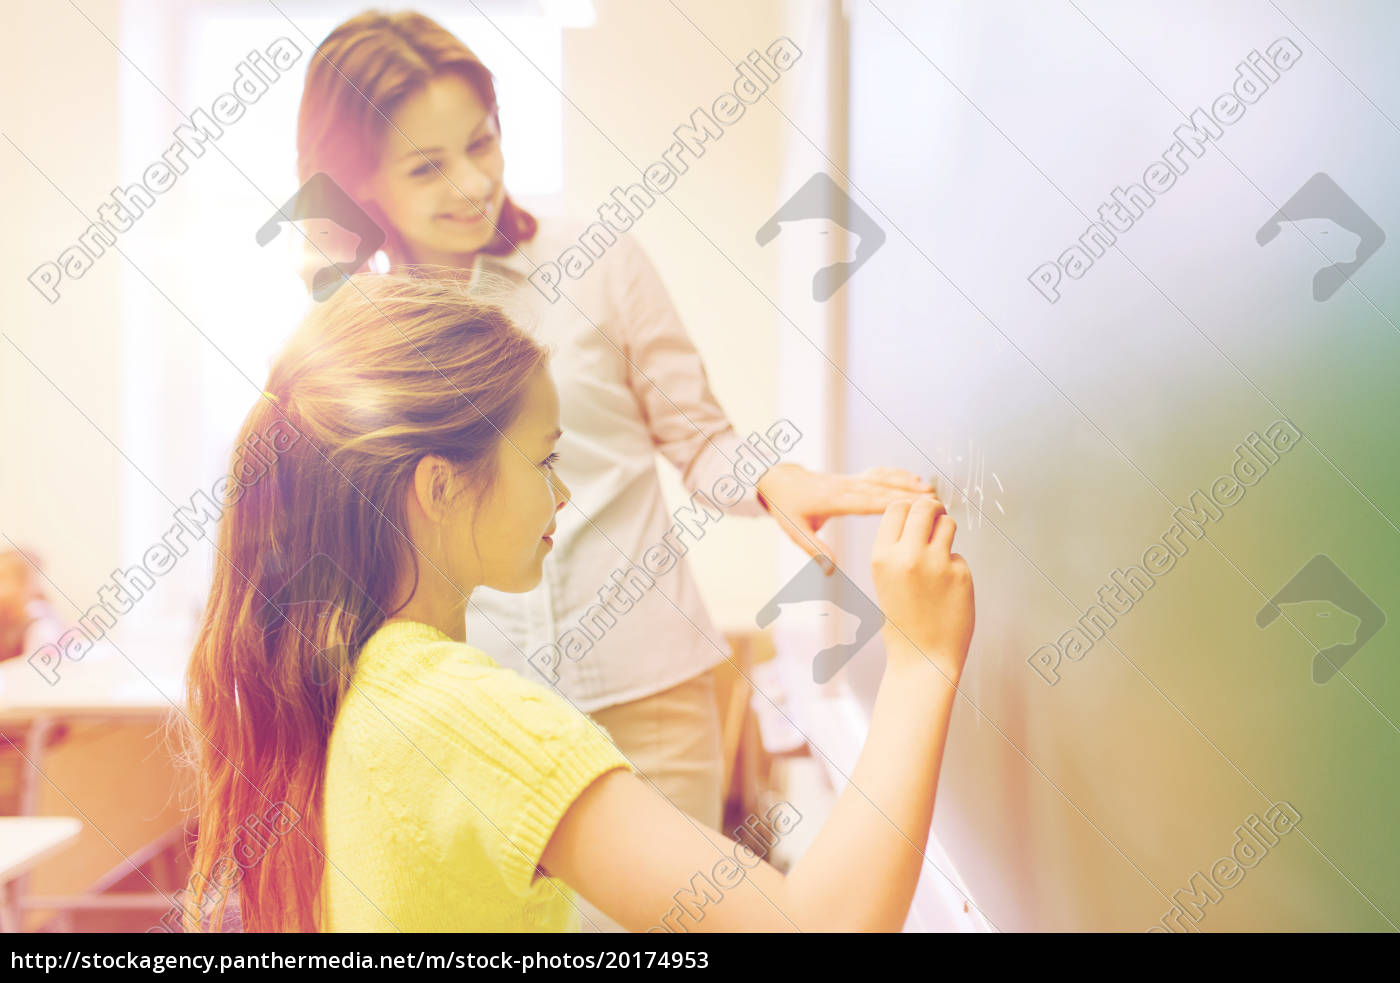 little, smiling, schoolgirl, writing, on, chalk - 20174953